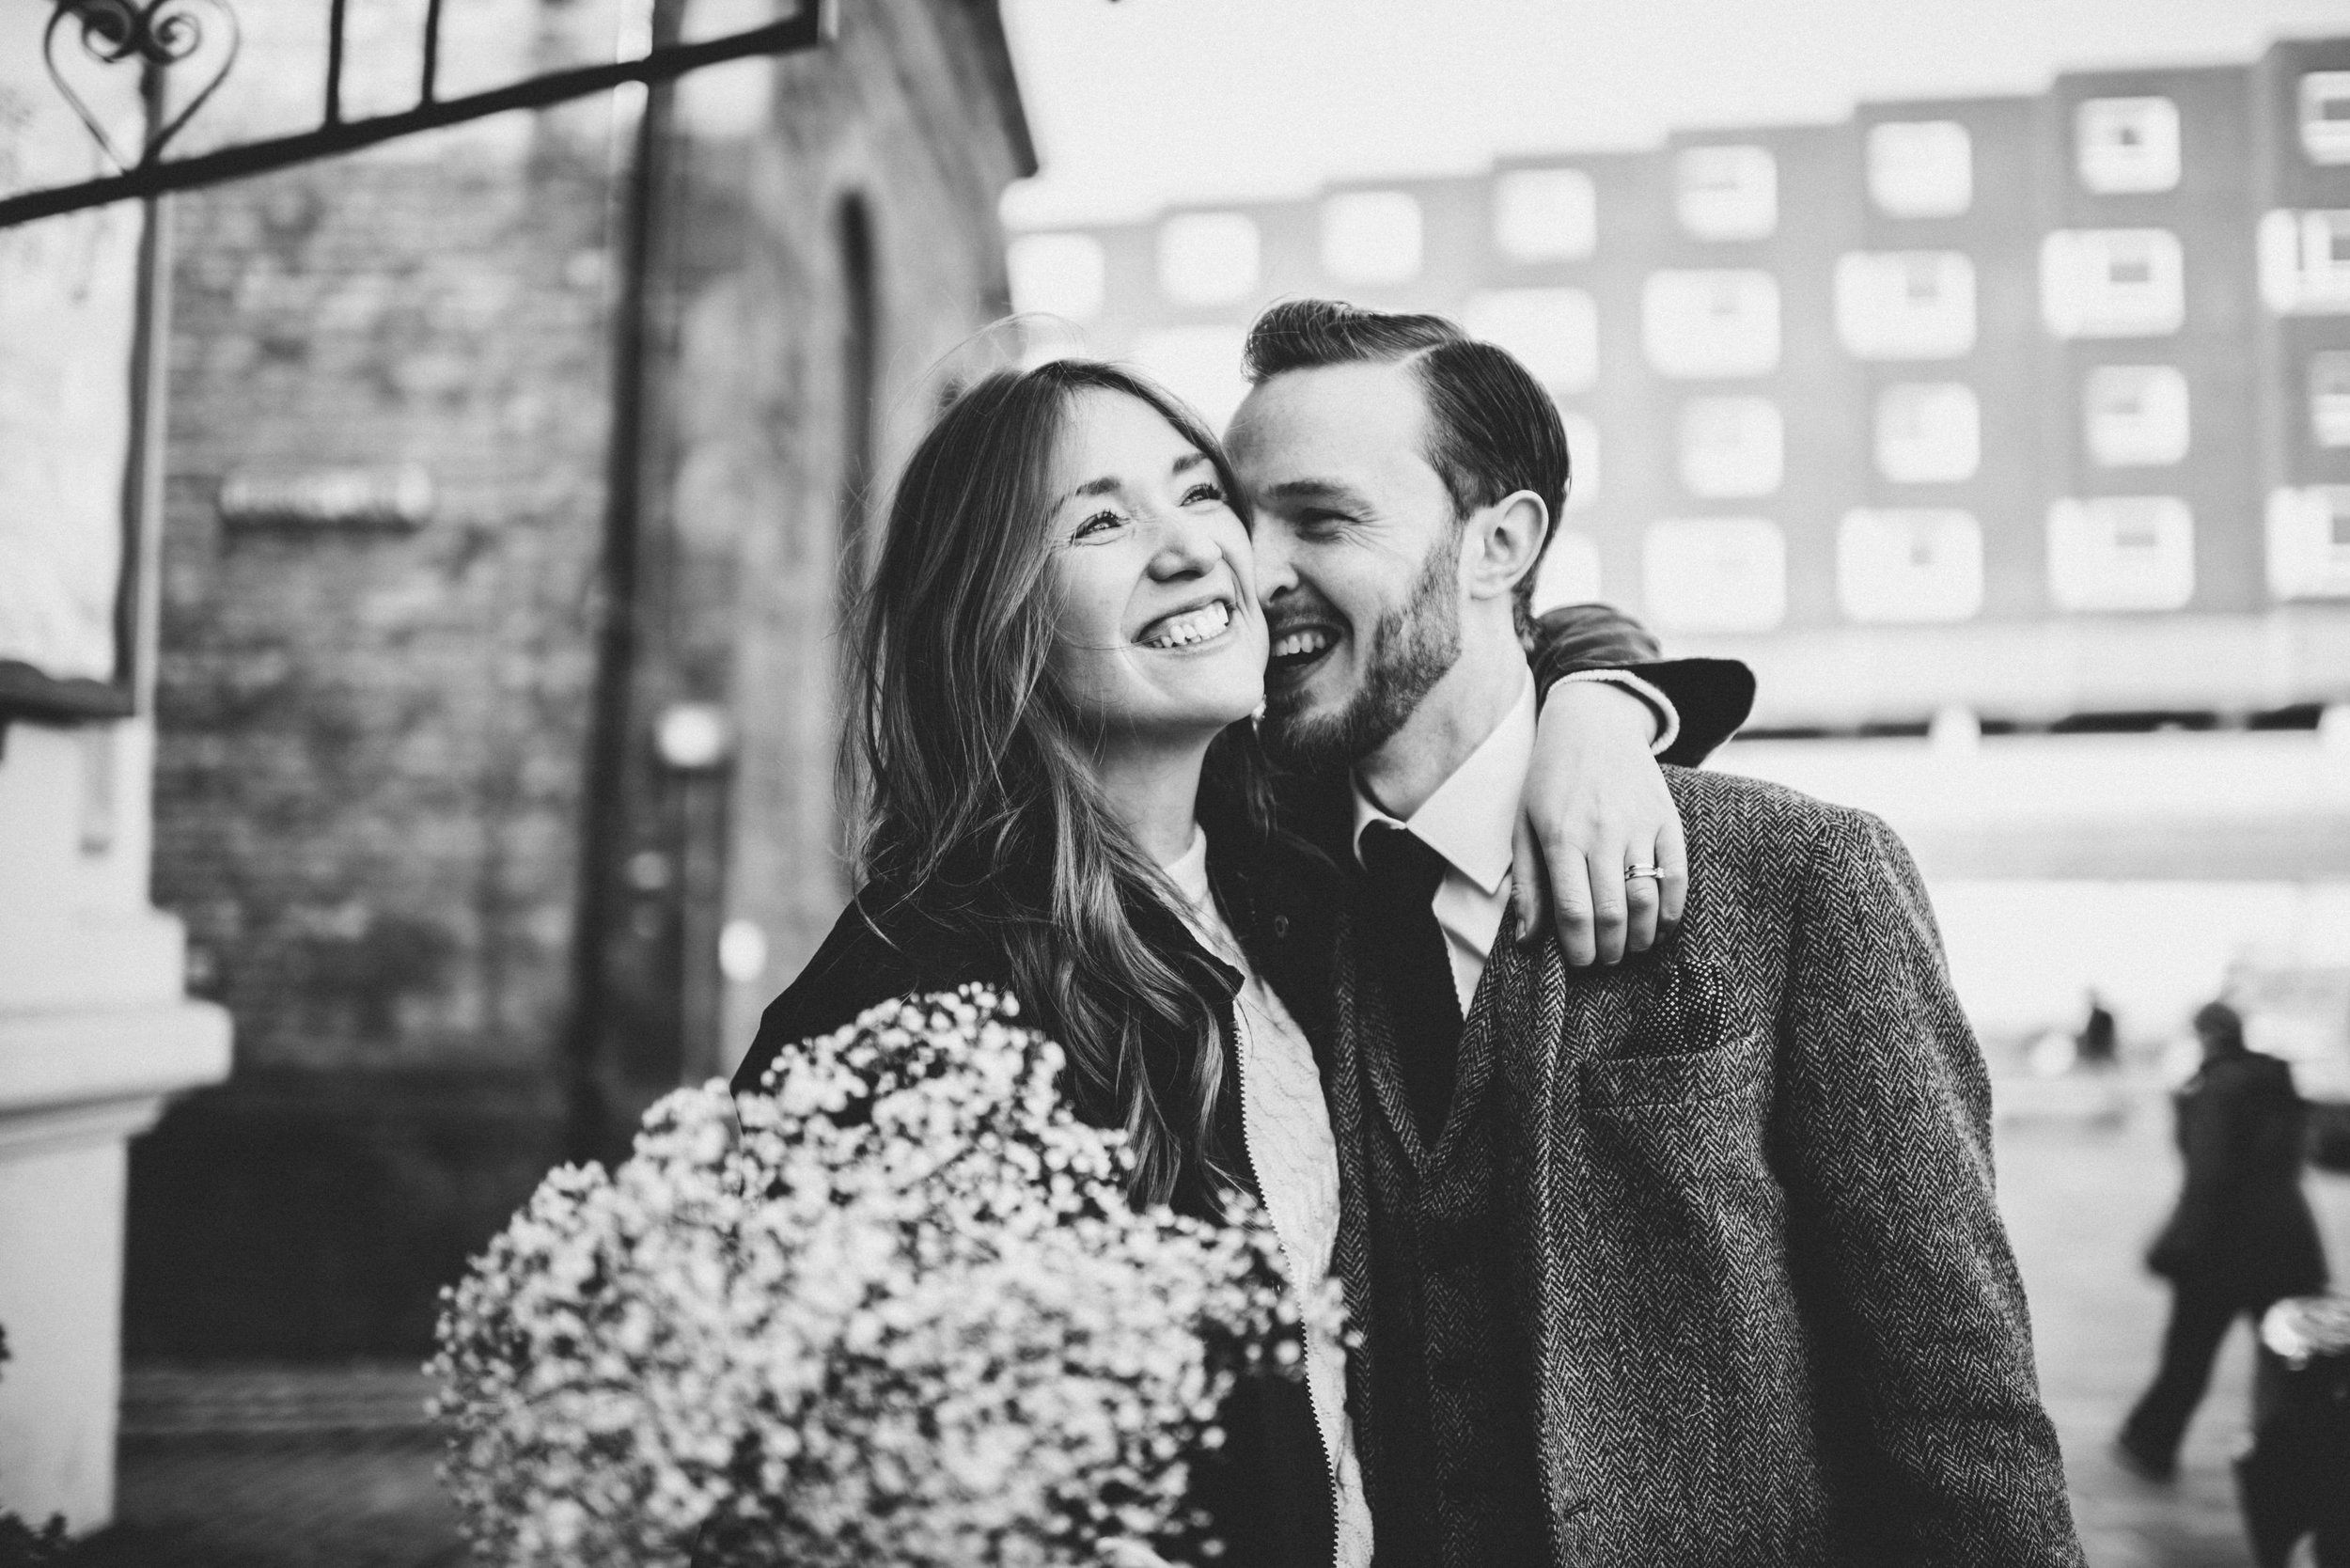 0089-LISA-DEVINE-PHOTOGRAPHY-ALTERNATIVE-WEDDING-PHOTOGRAPHY-SCOTLAND-DESTINATION-WEDDINGS-GLASGOW-WEDDINGS-COOL-WEDDINGS-STYLISH-WEDDINGS.JPG